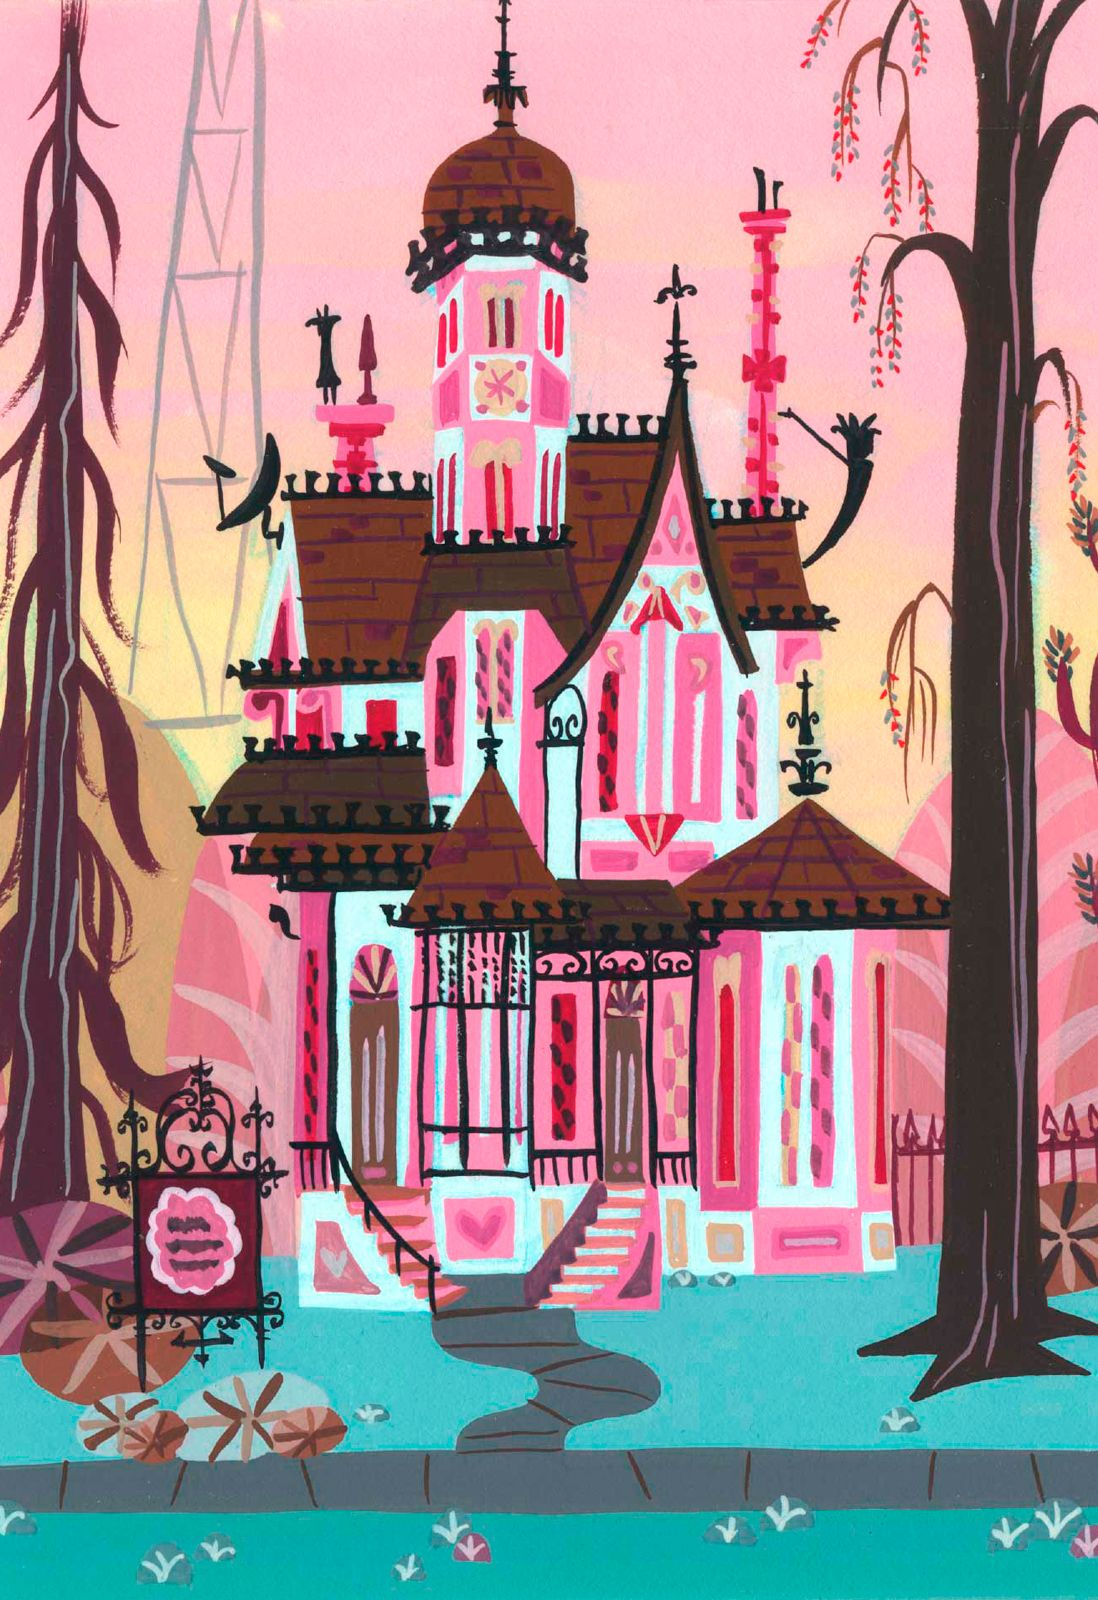 Foster's home for imaginary friends concept art - Carol Wyatt